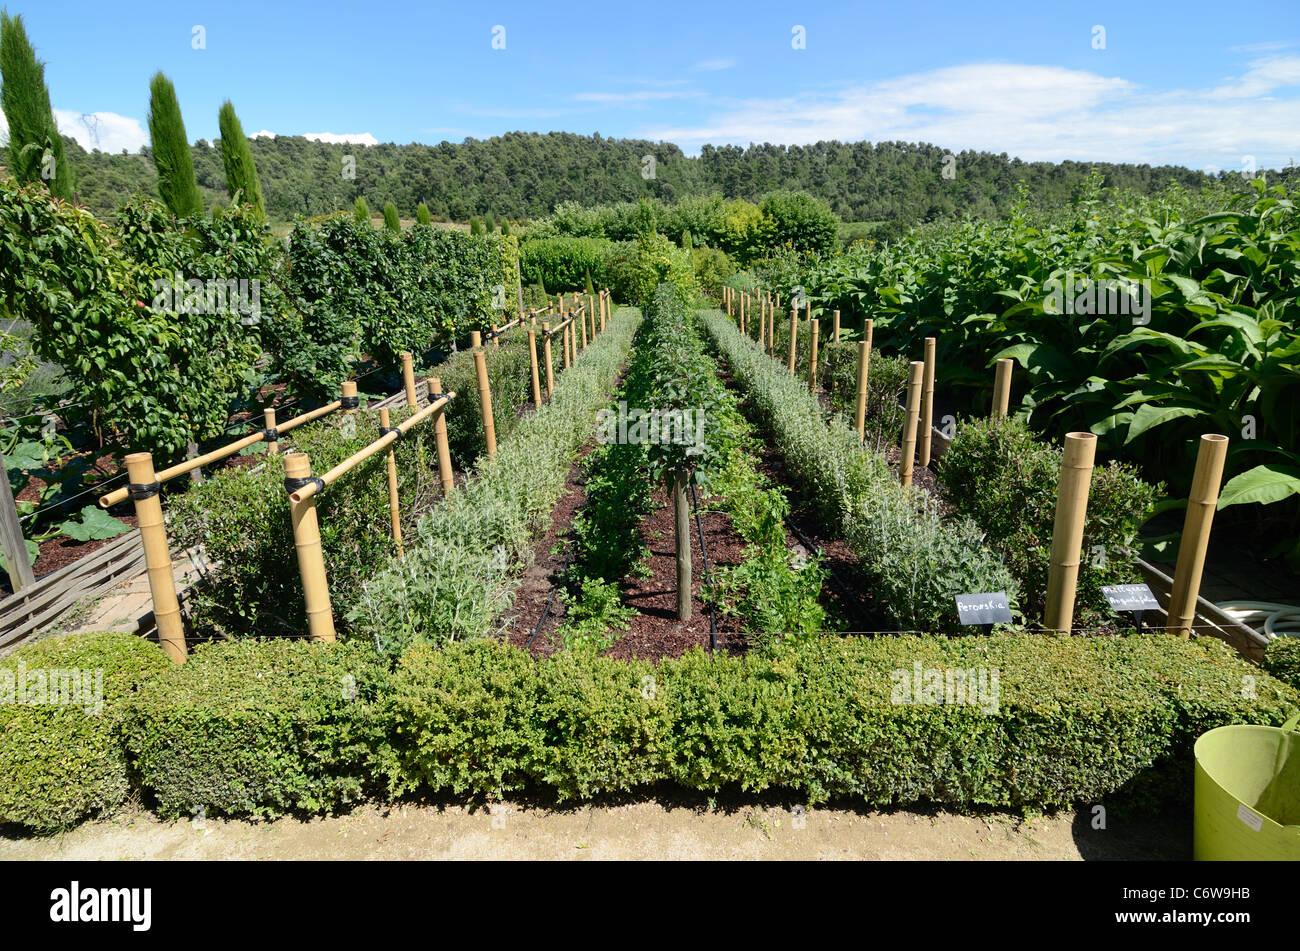 Kitchen Garden or Vegetable & Fruit Garden, Val Joannis Gardens Pertuis Luberon Provence France - Stock Image